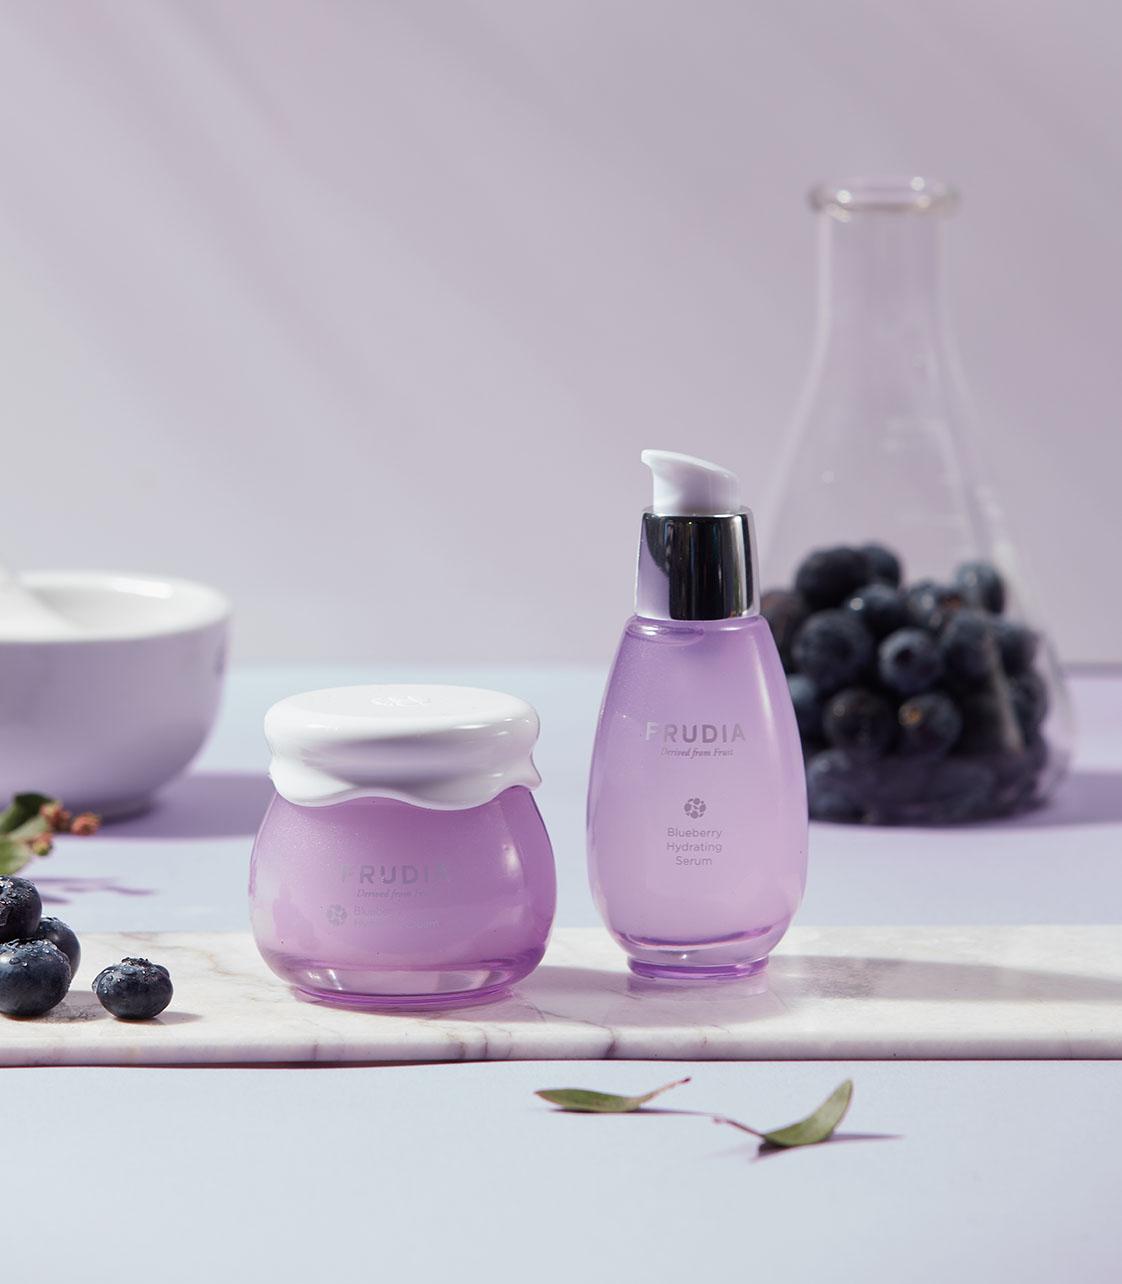 Frudia Blueberry Hydrating kasvovoide ja seerumi 1